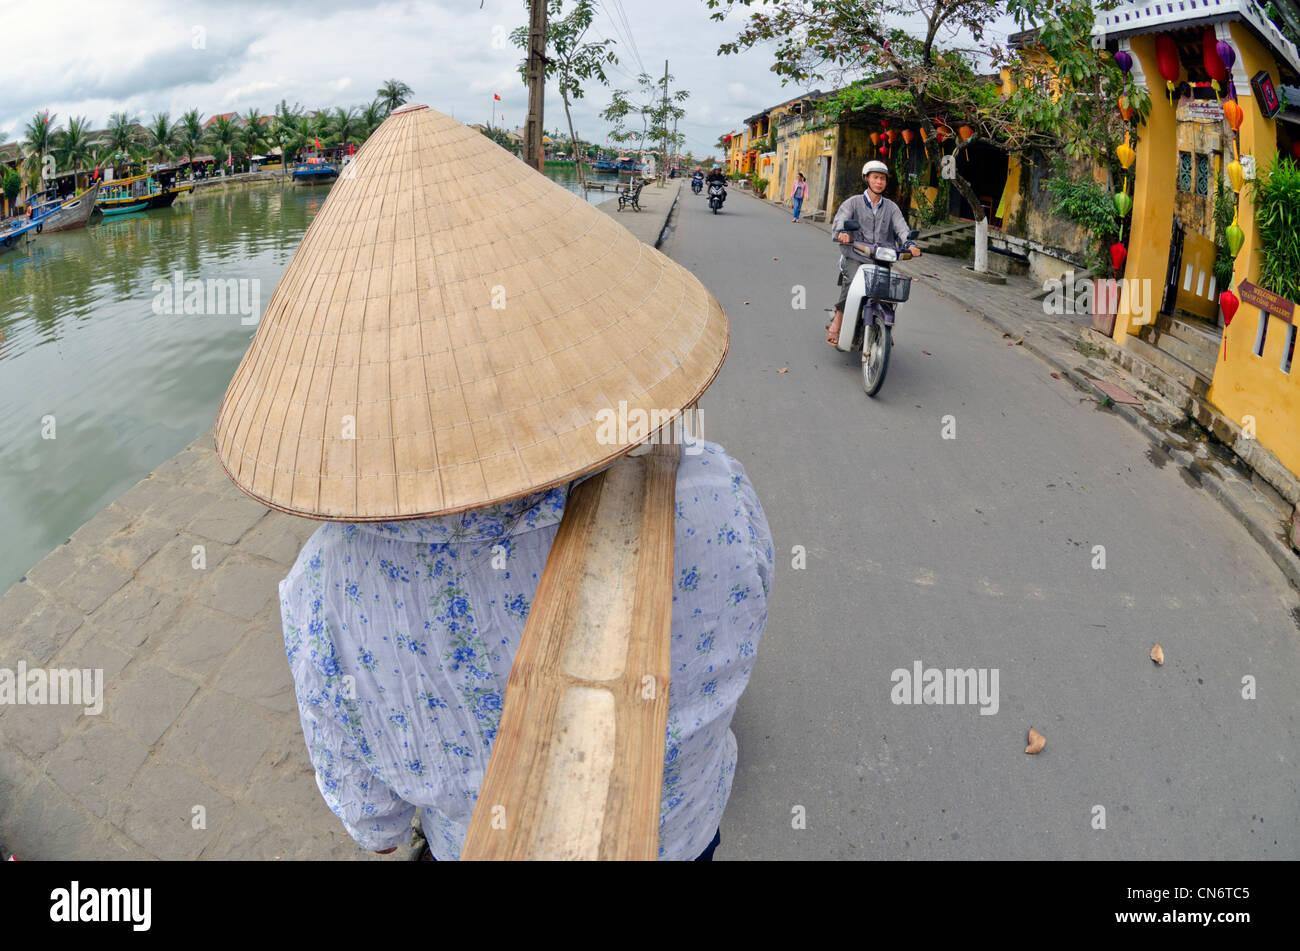 Woman carrying yoke baskets of fruit in street, Hoi An, Vietnam - Stock Image